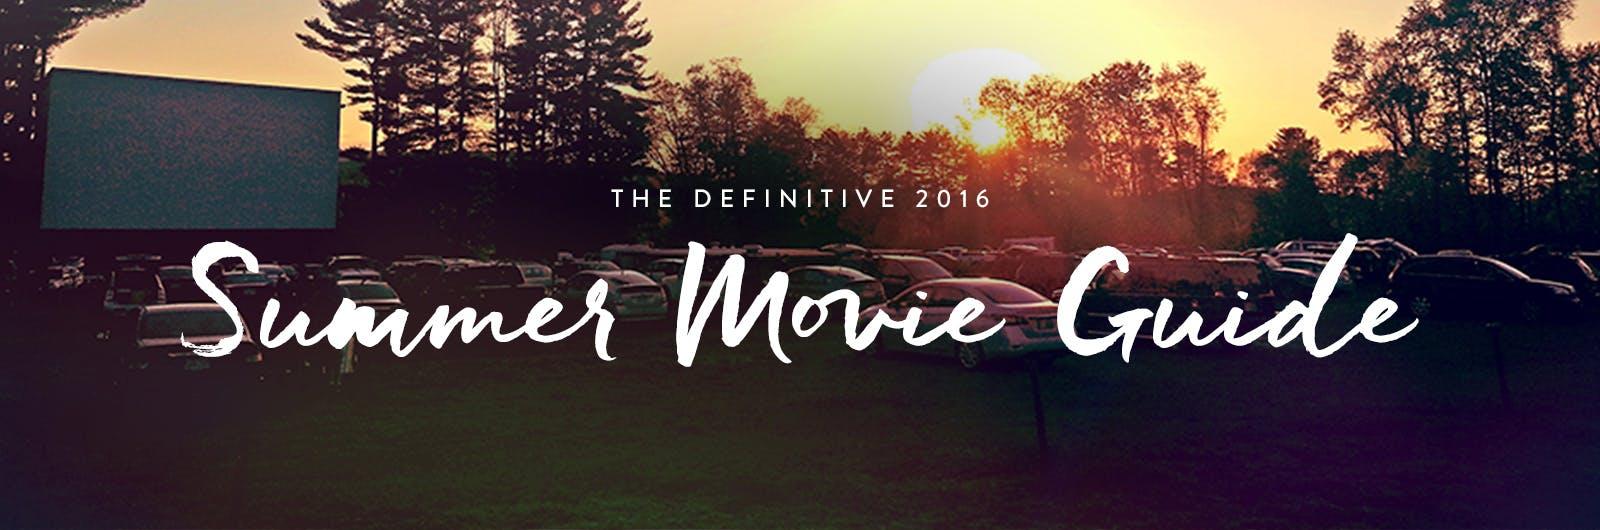 summer movie guide